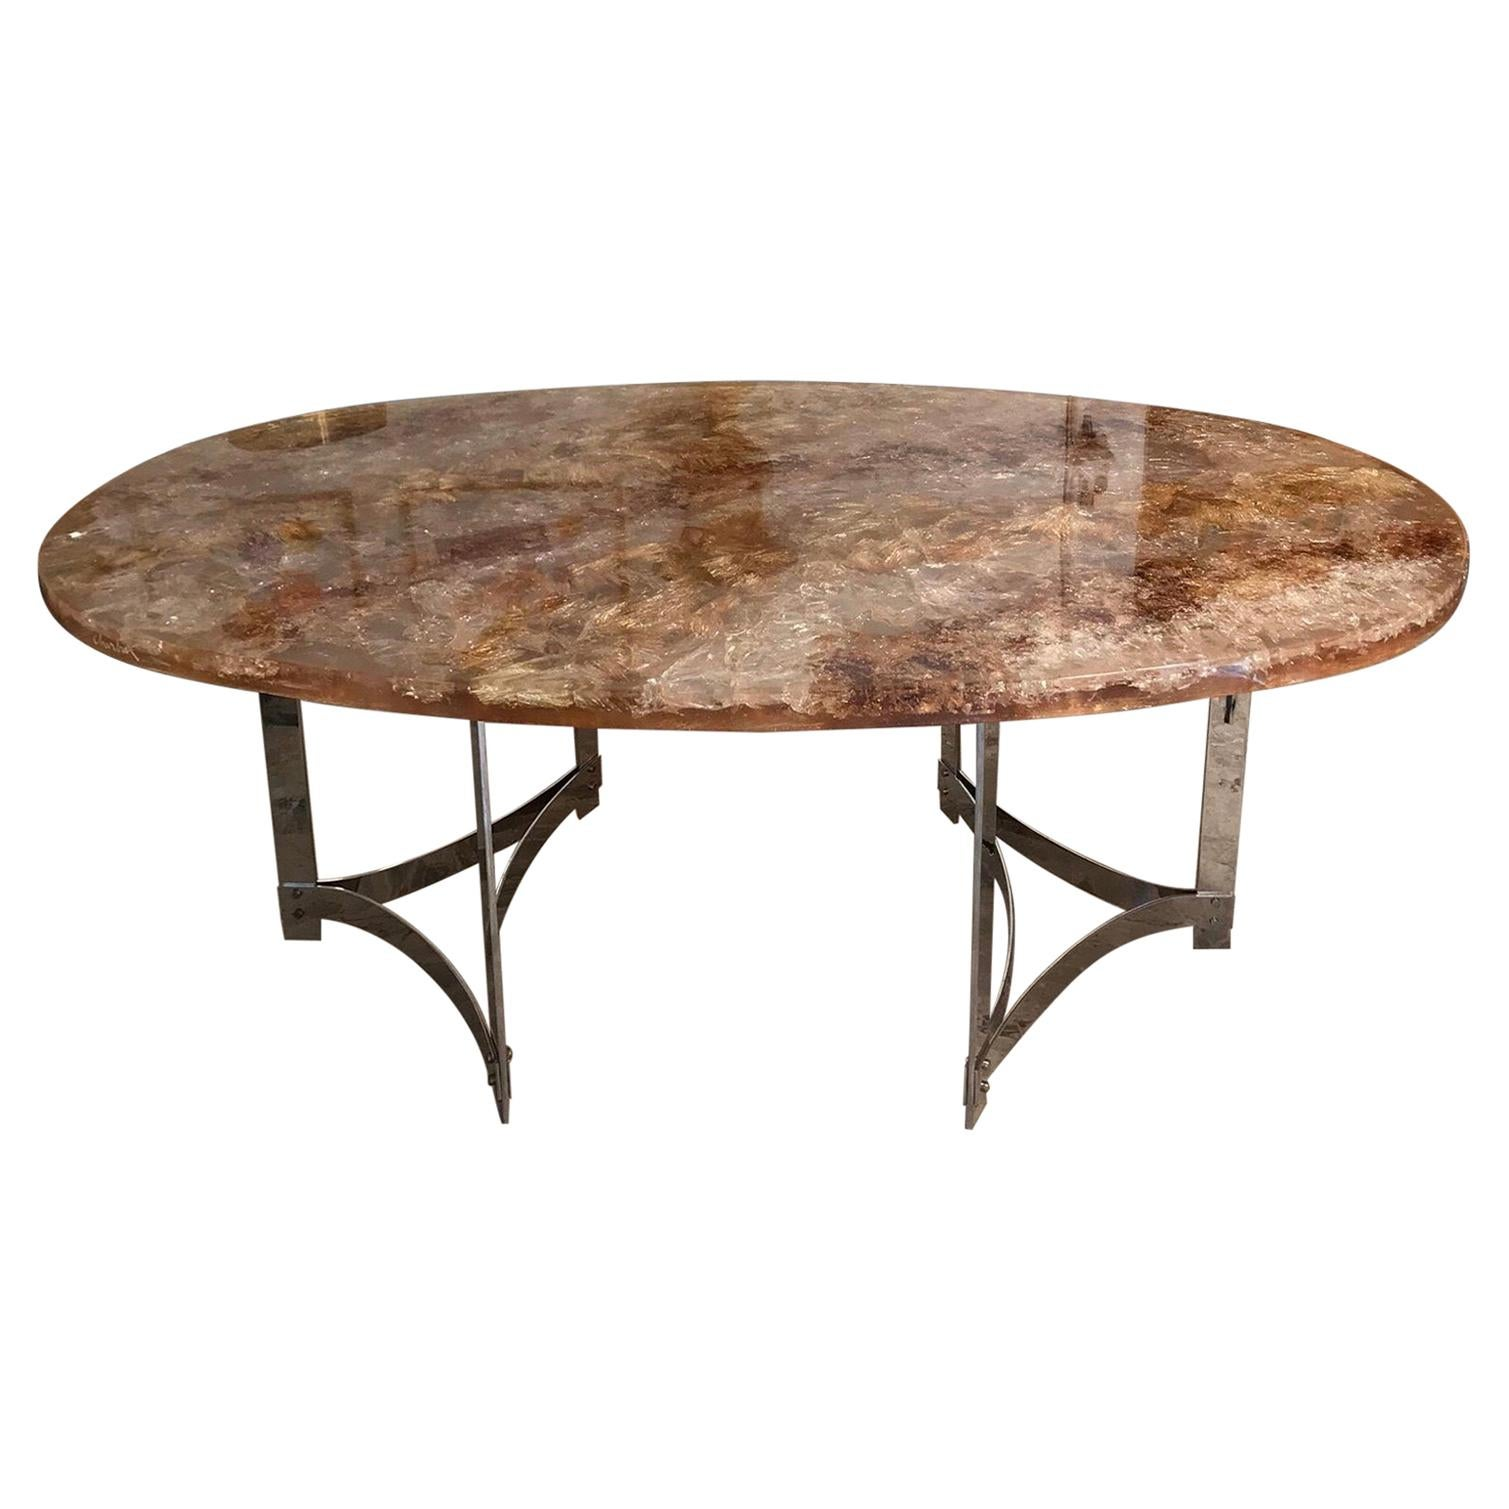 Fractal Resin Dinning Room Table by Gilles Charbin